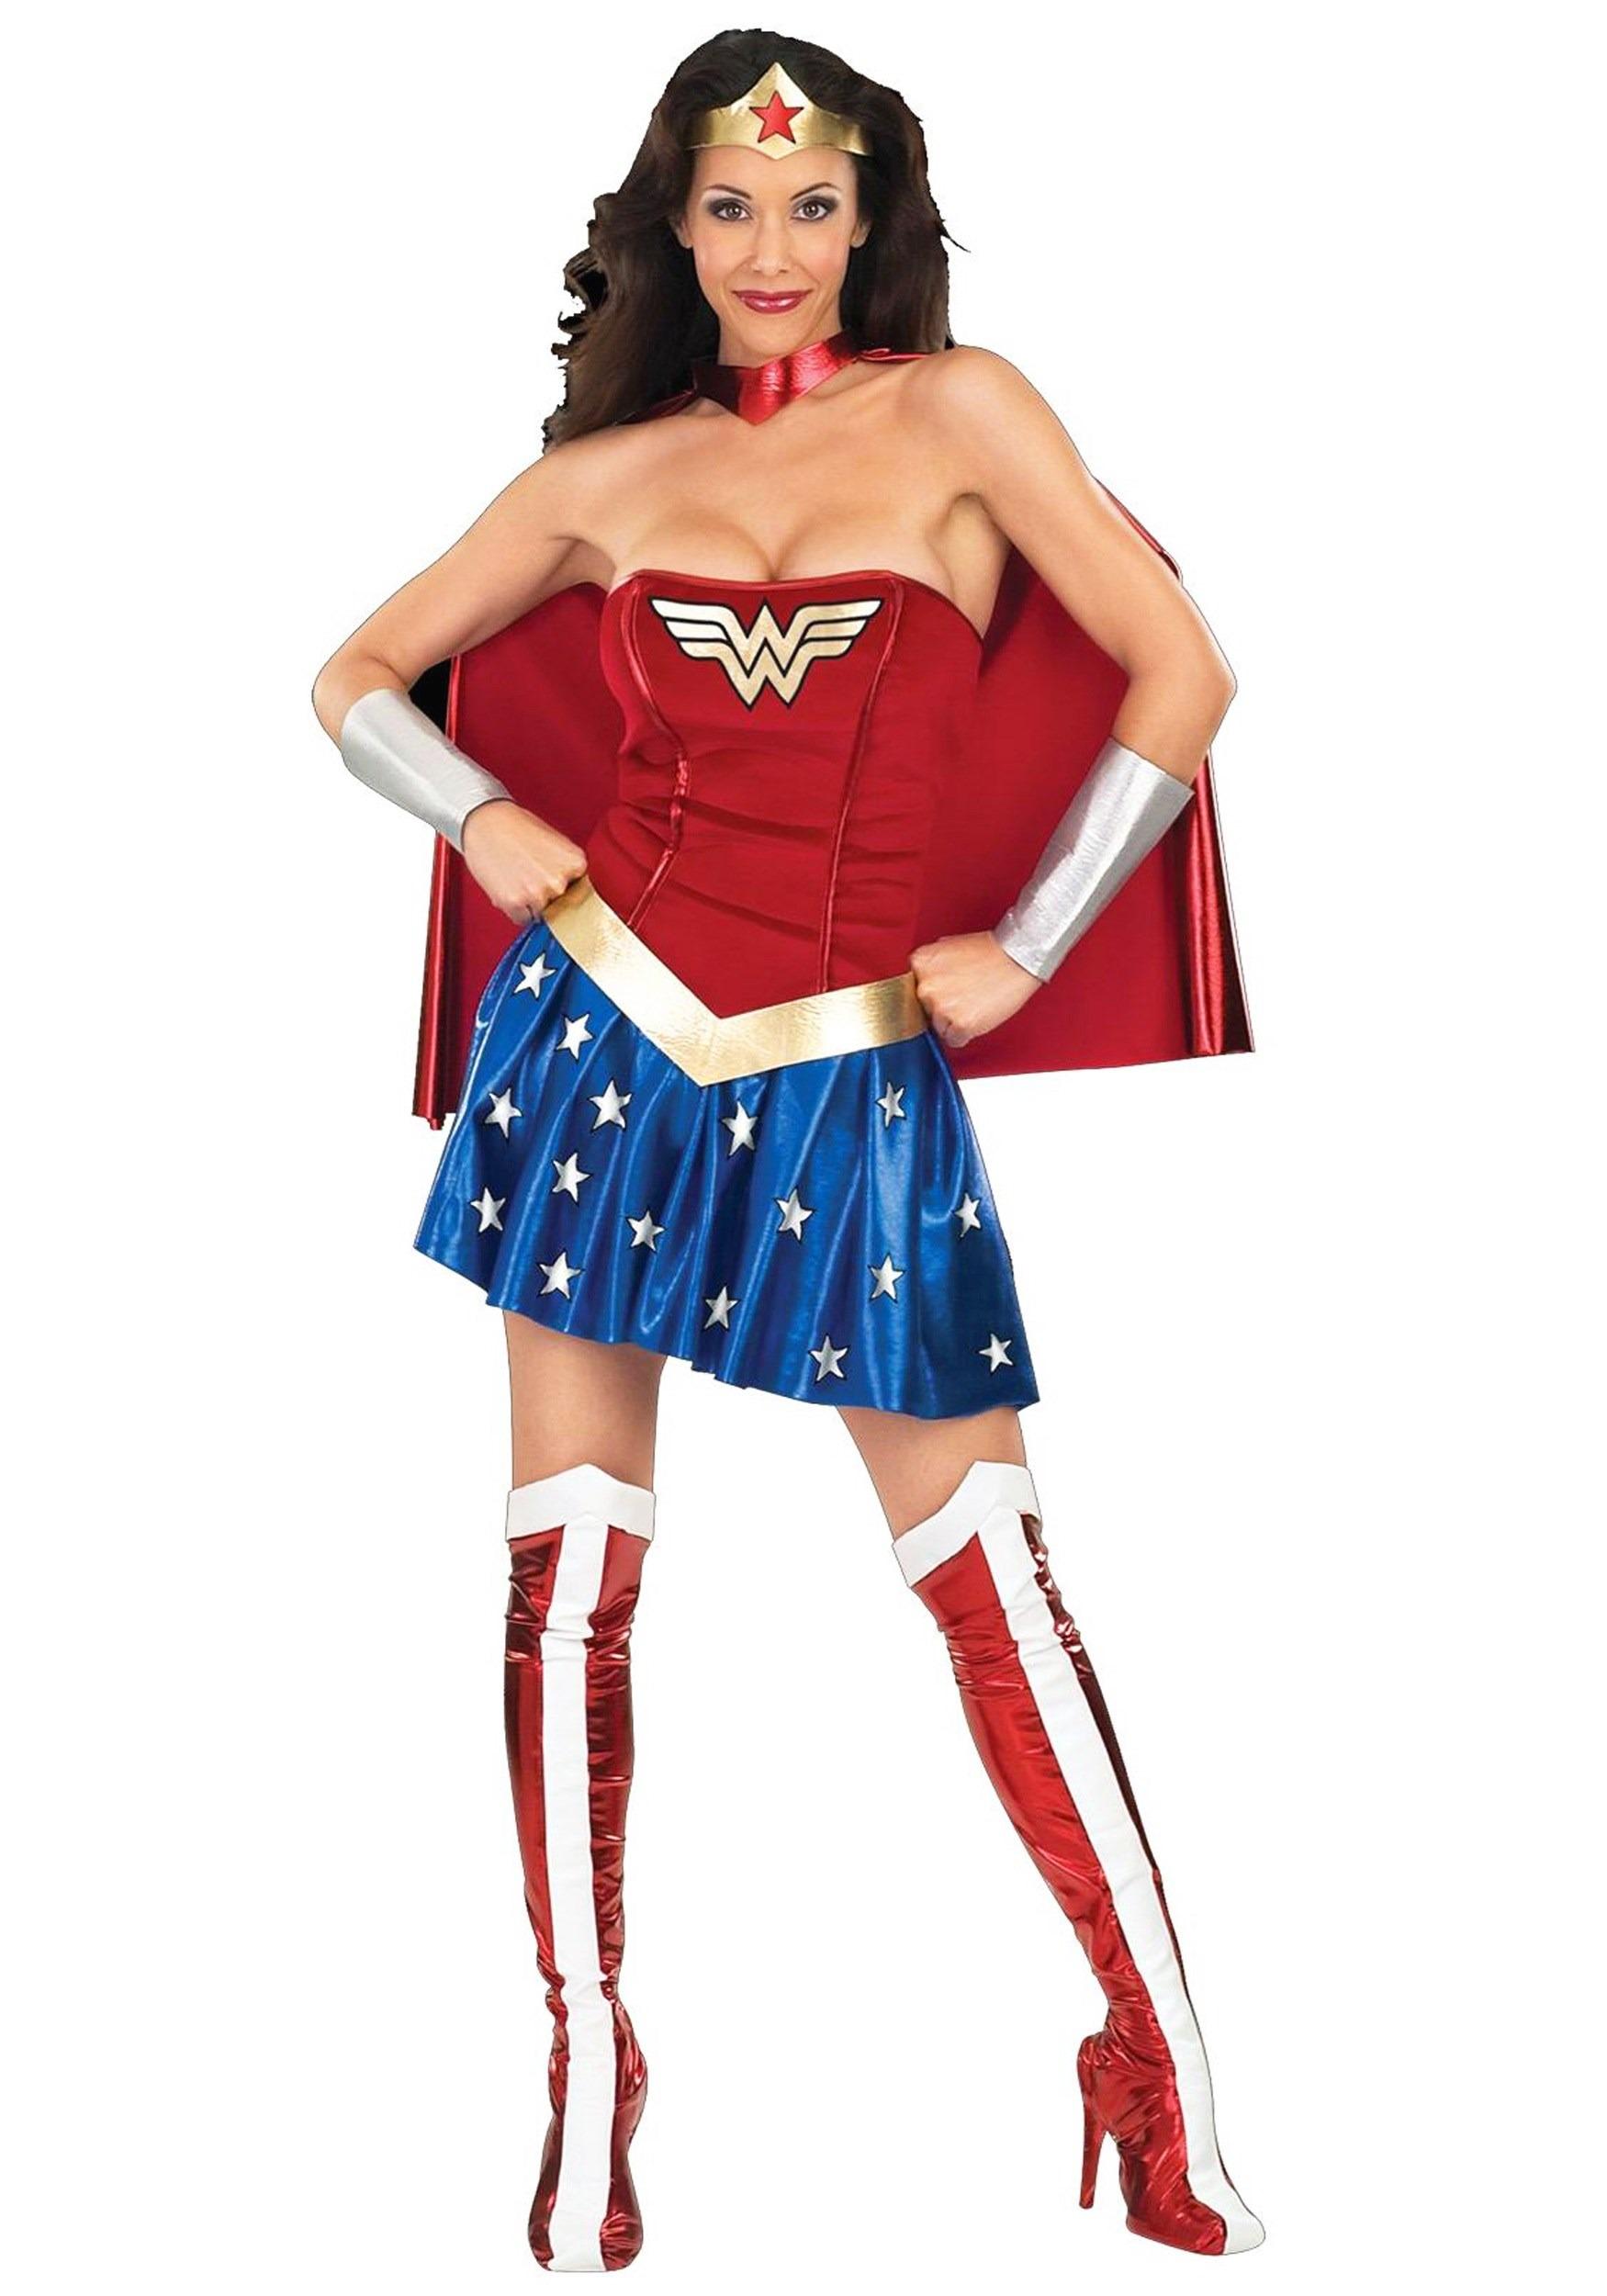 Wonder Woman Costume  sc 1 st  Halloween Costume & Wonder Woman Costume - Adult Halloween Wonder Woman Costumes